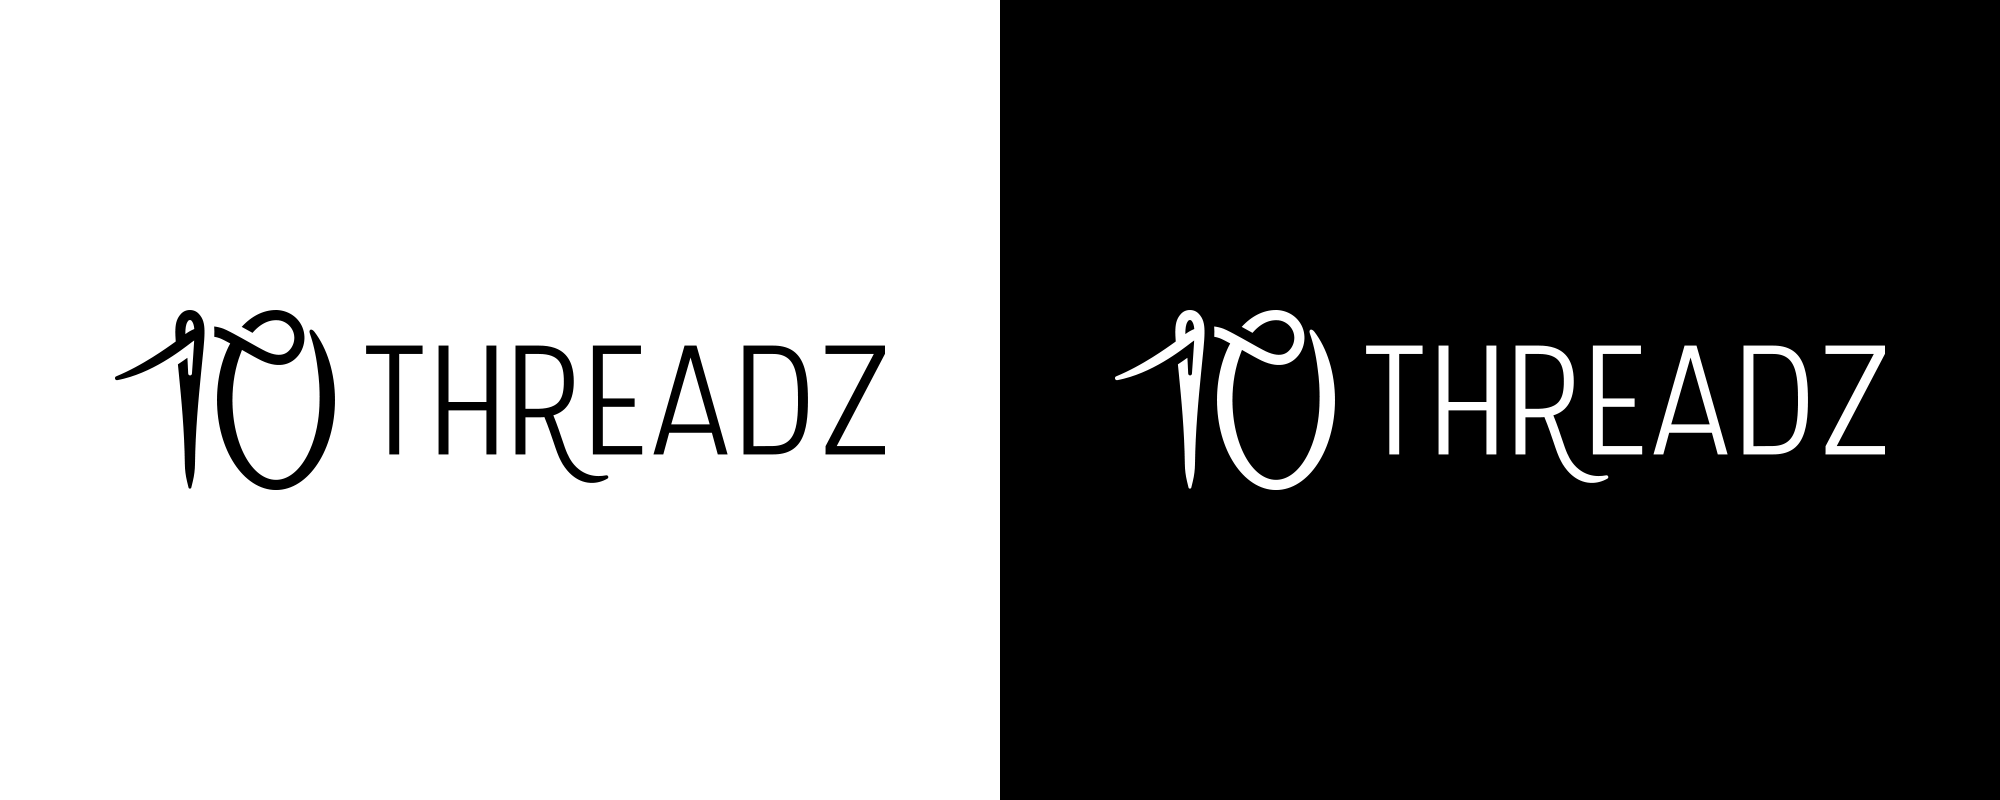 10n22